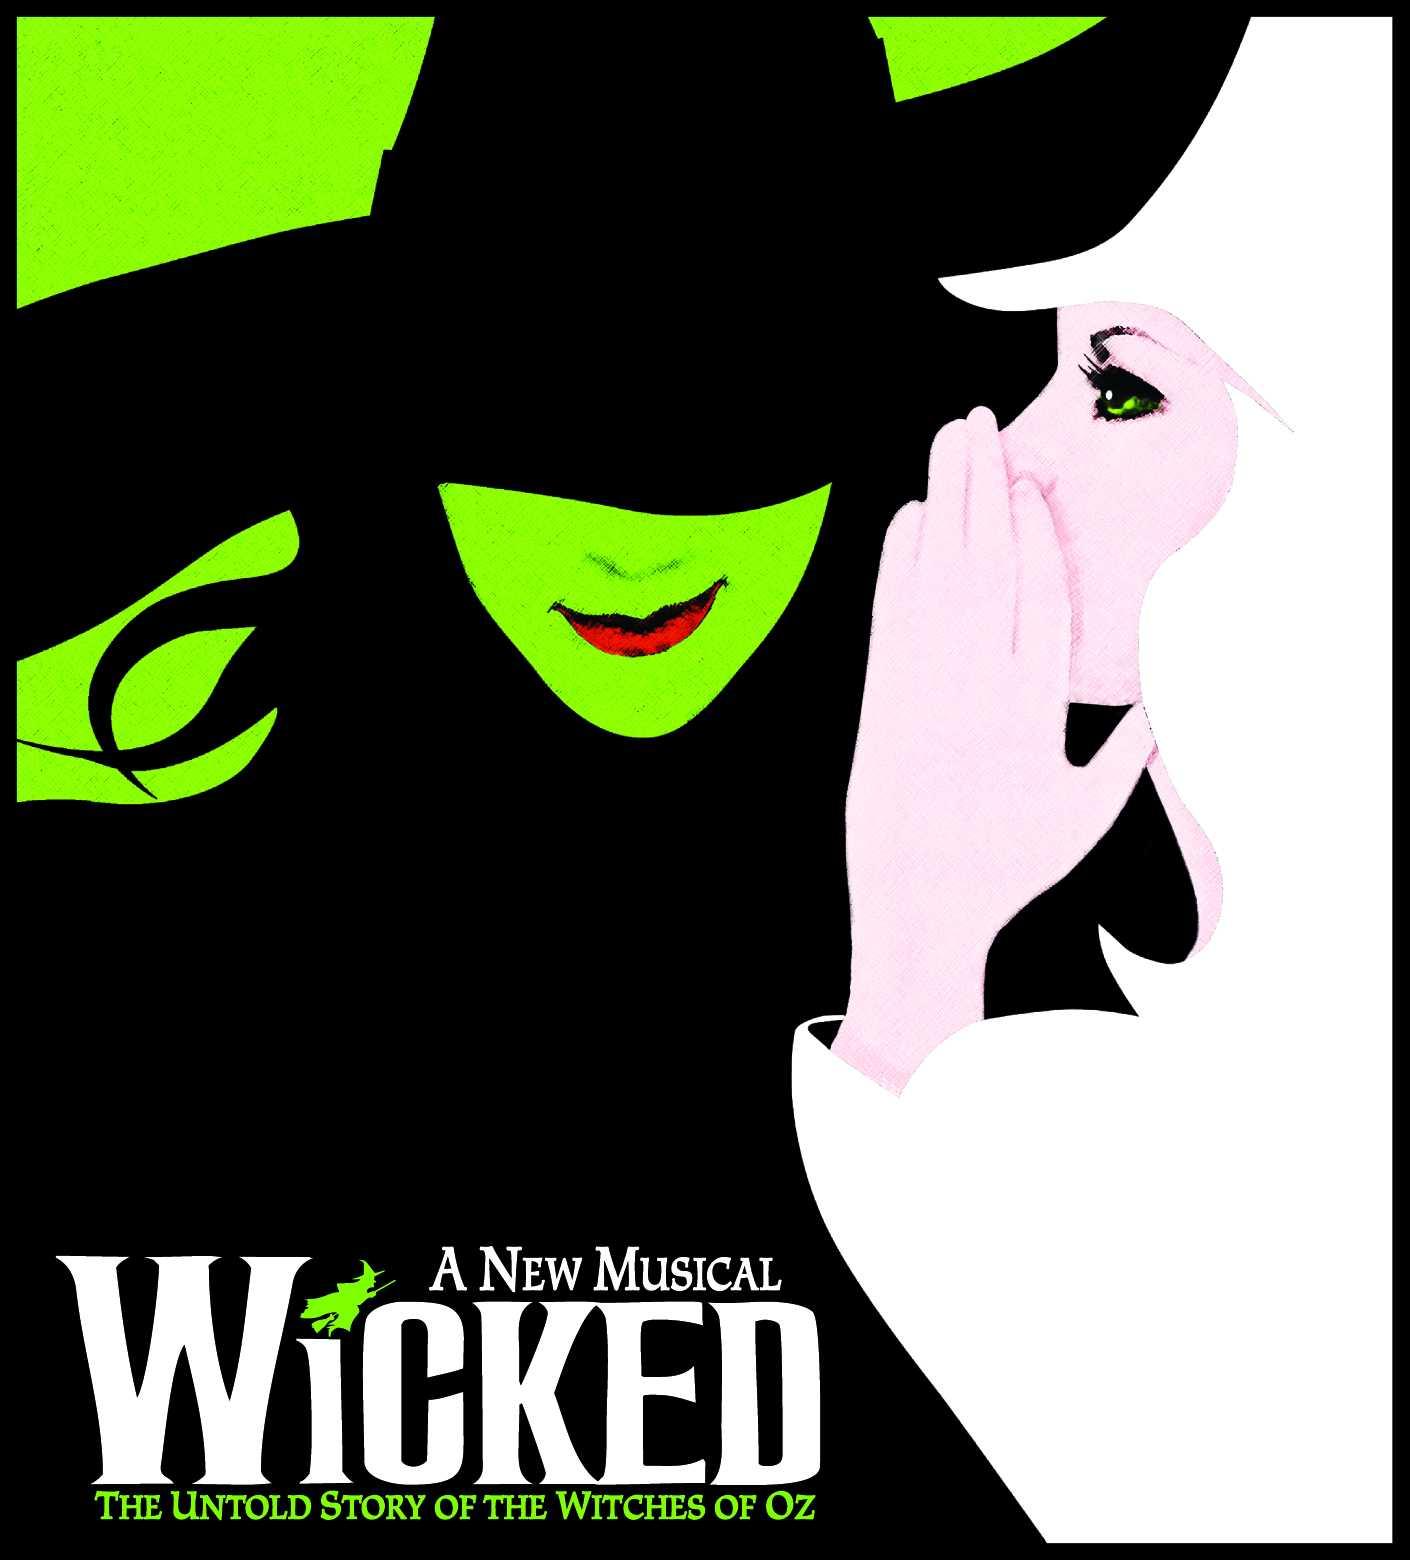 Wicked Brings In Big Bucks To Break Broadway Record